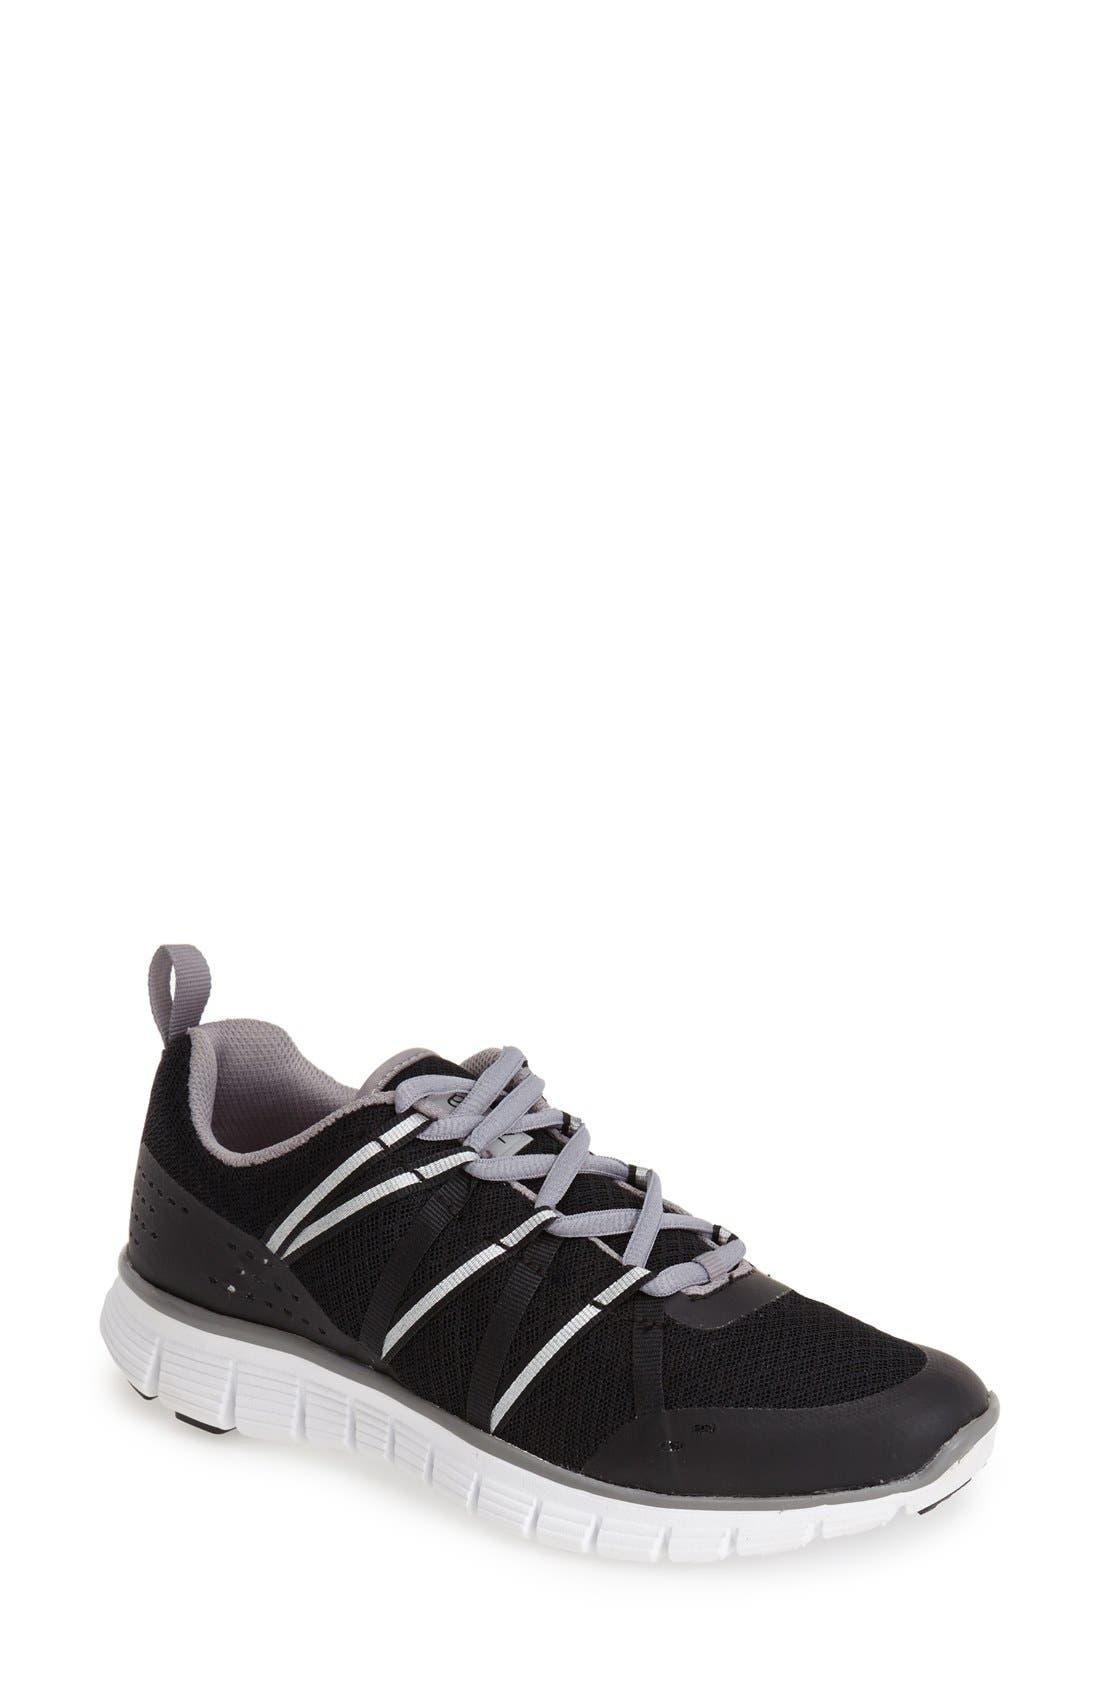 Alternate Image 1 Selected - Zella 'Dash' Running Shoe (Women)